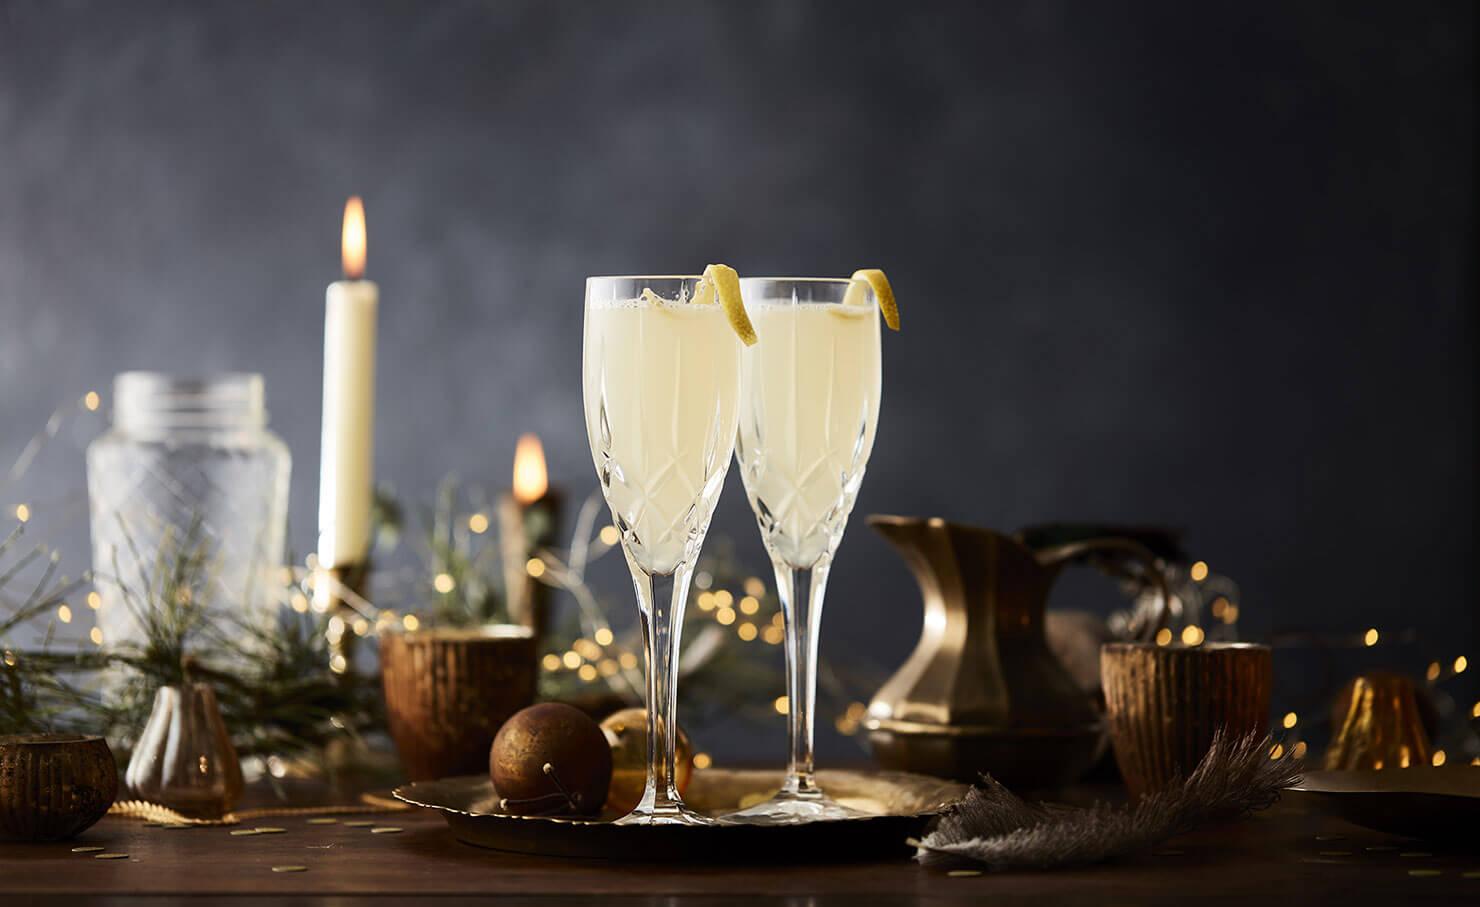 Hendricks Gin Premium Scottish Infused With Cucumber Rose Cetak Foto Ukuran 24r Salon Desktop Image